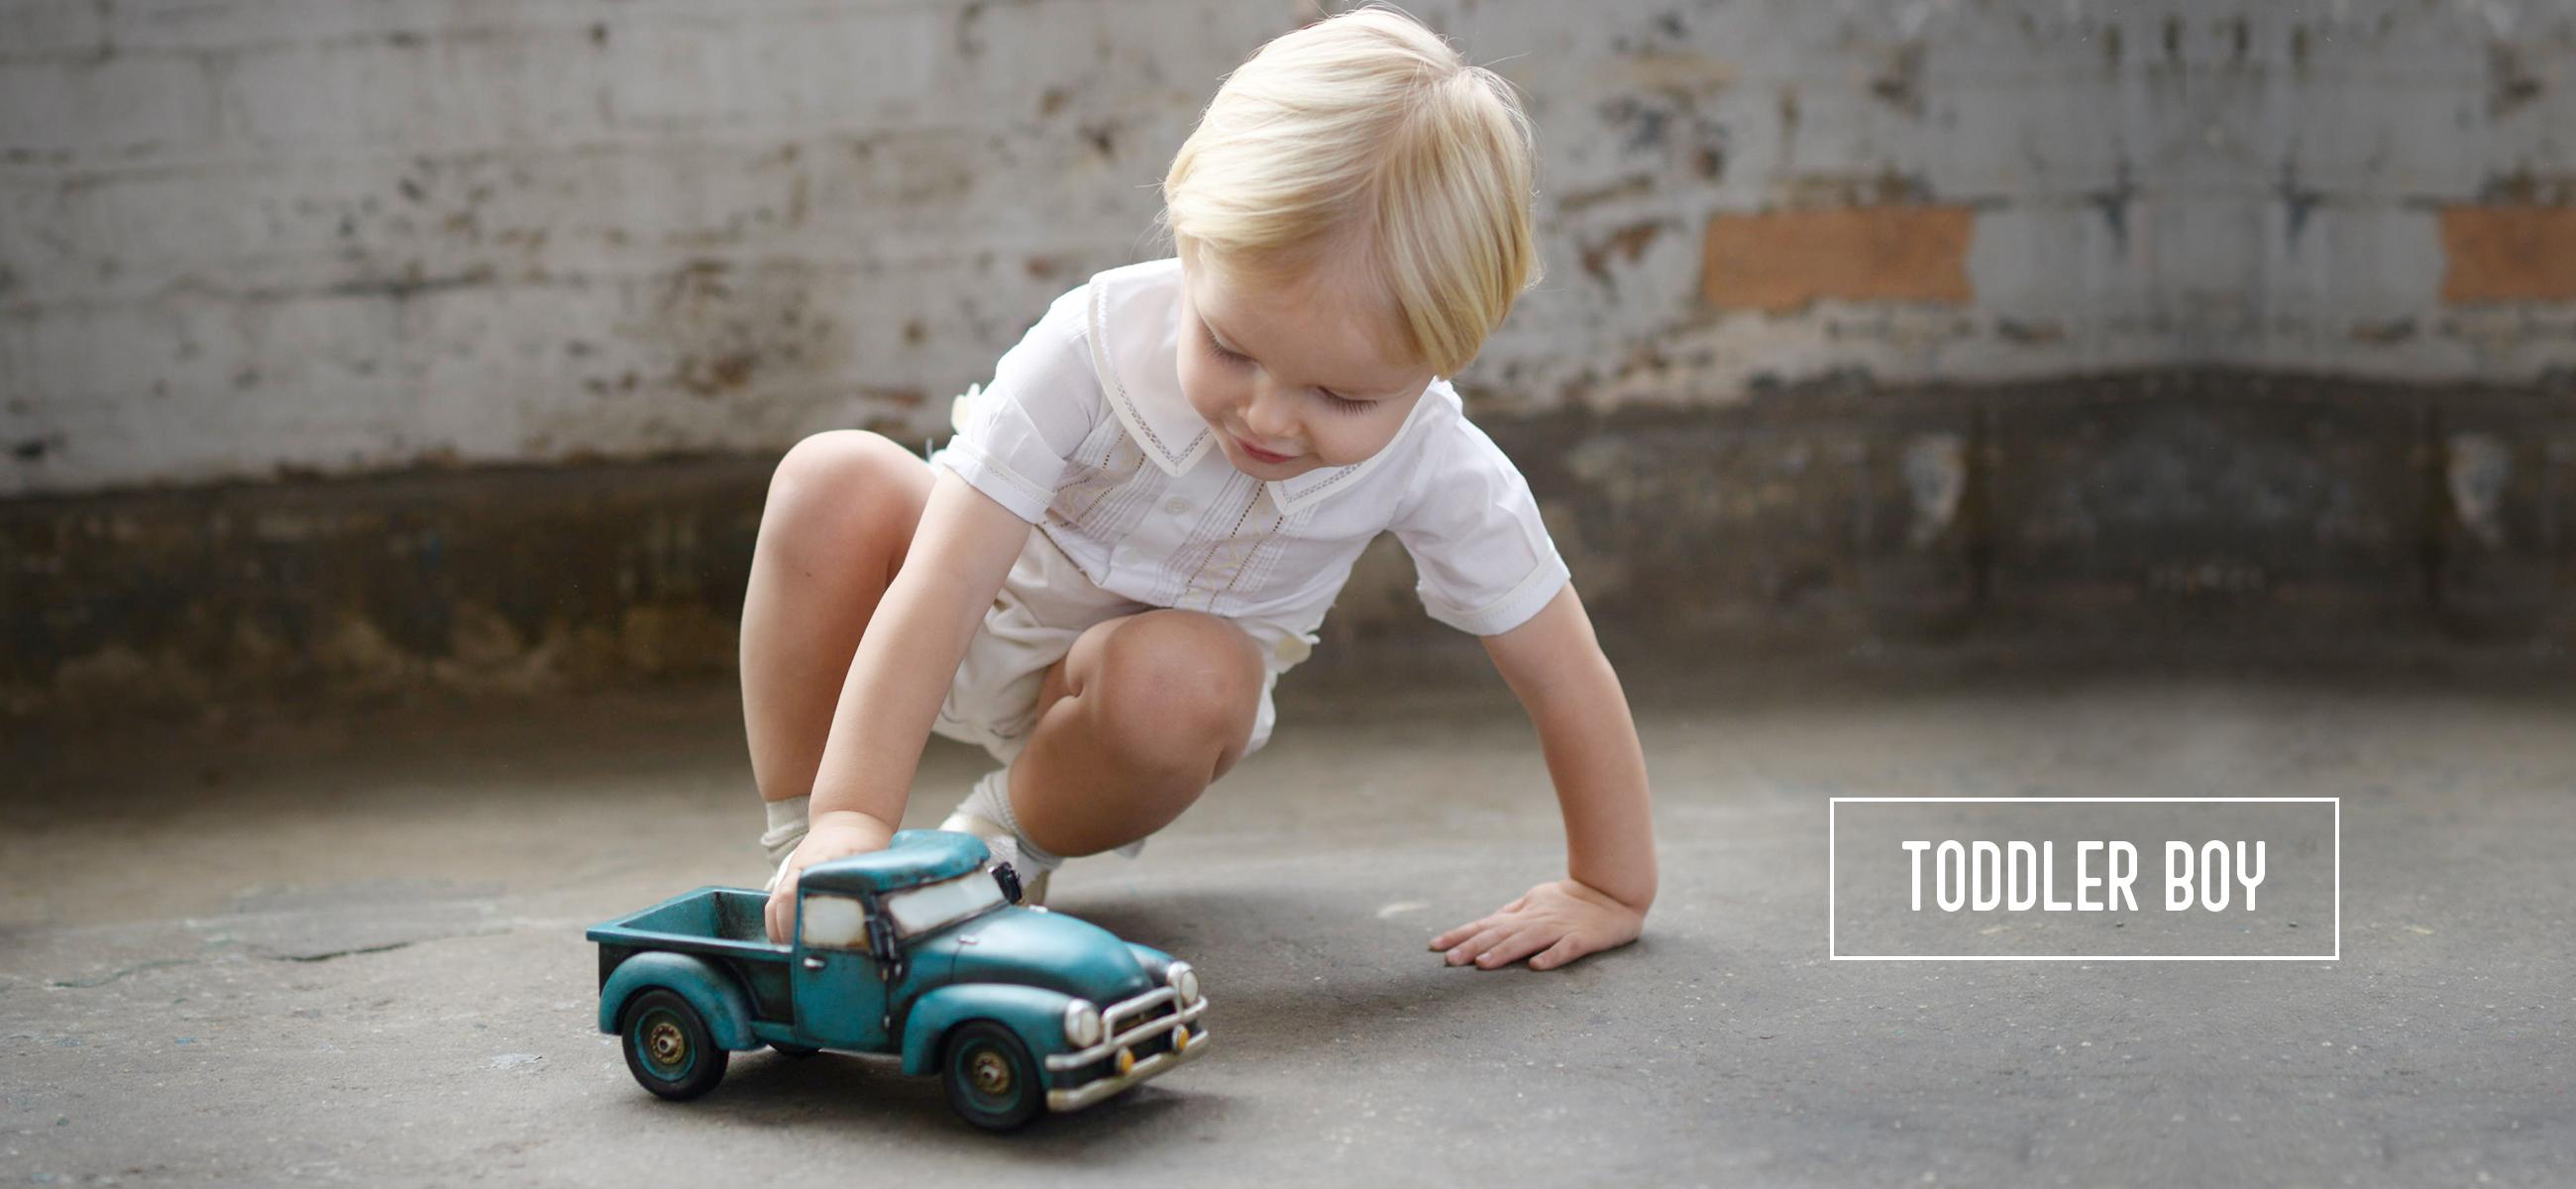 toddler-boy-18.jpg